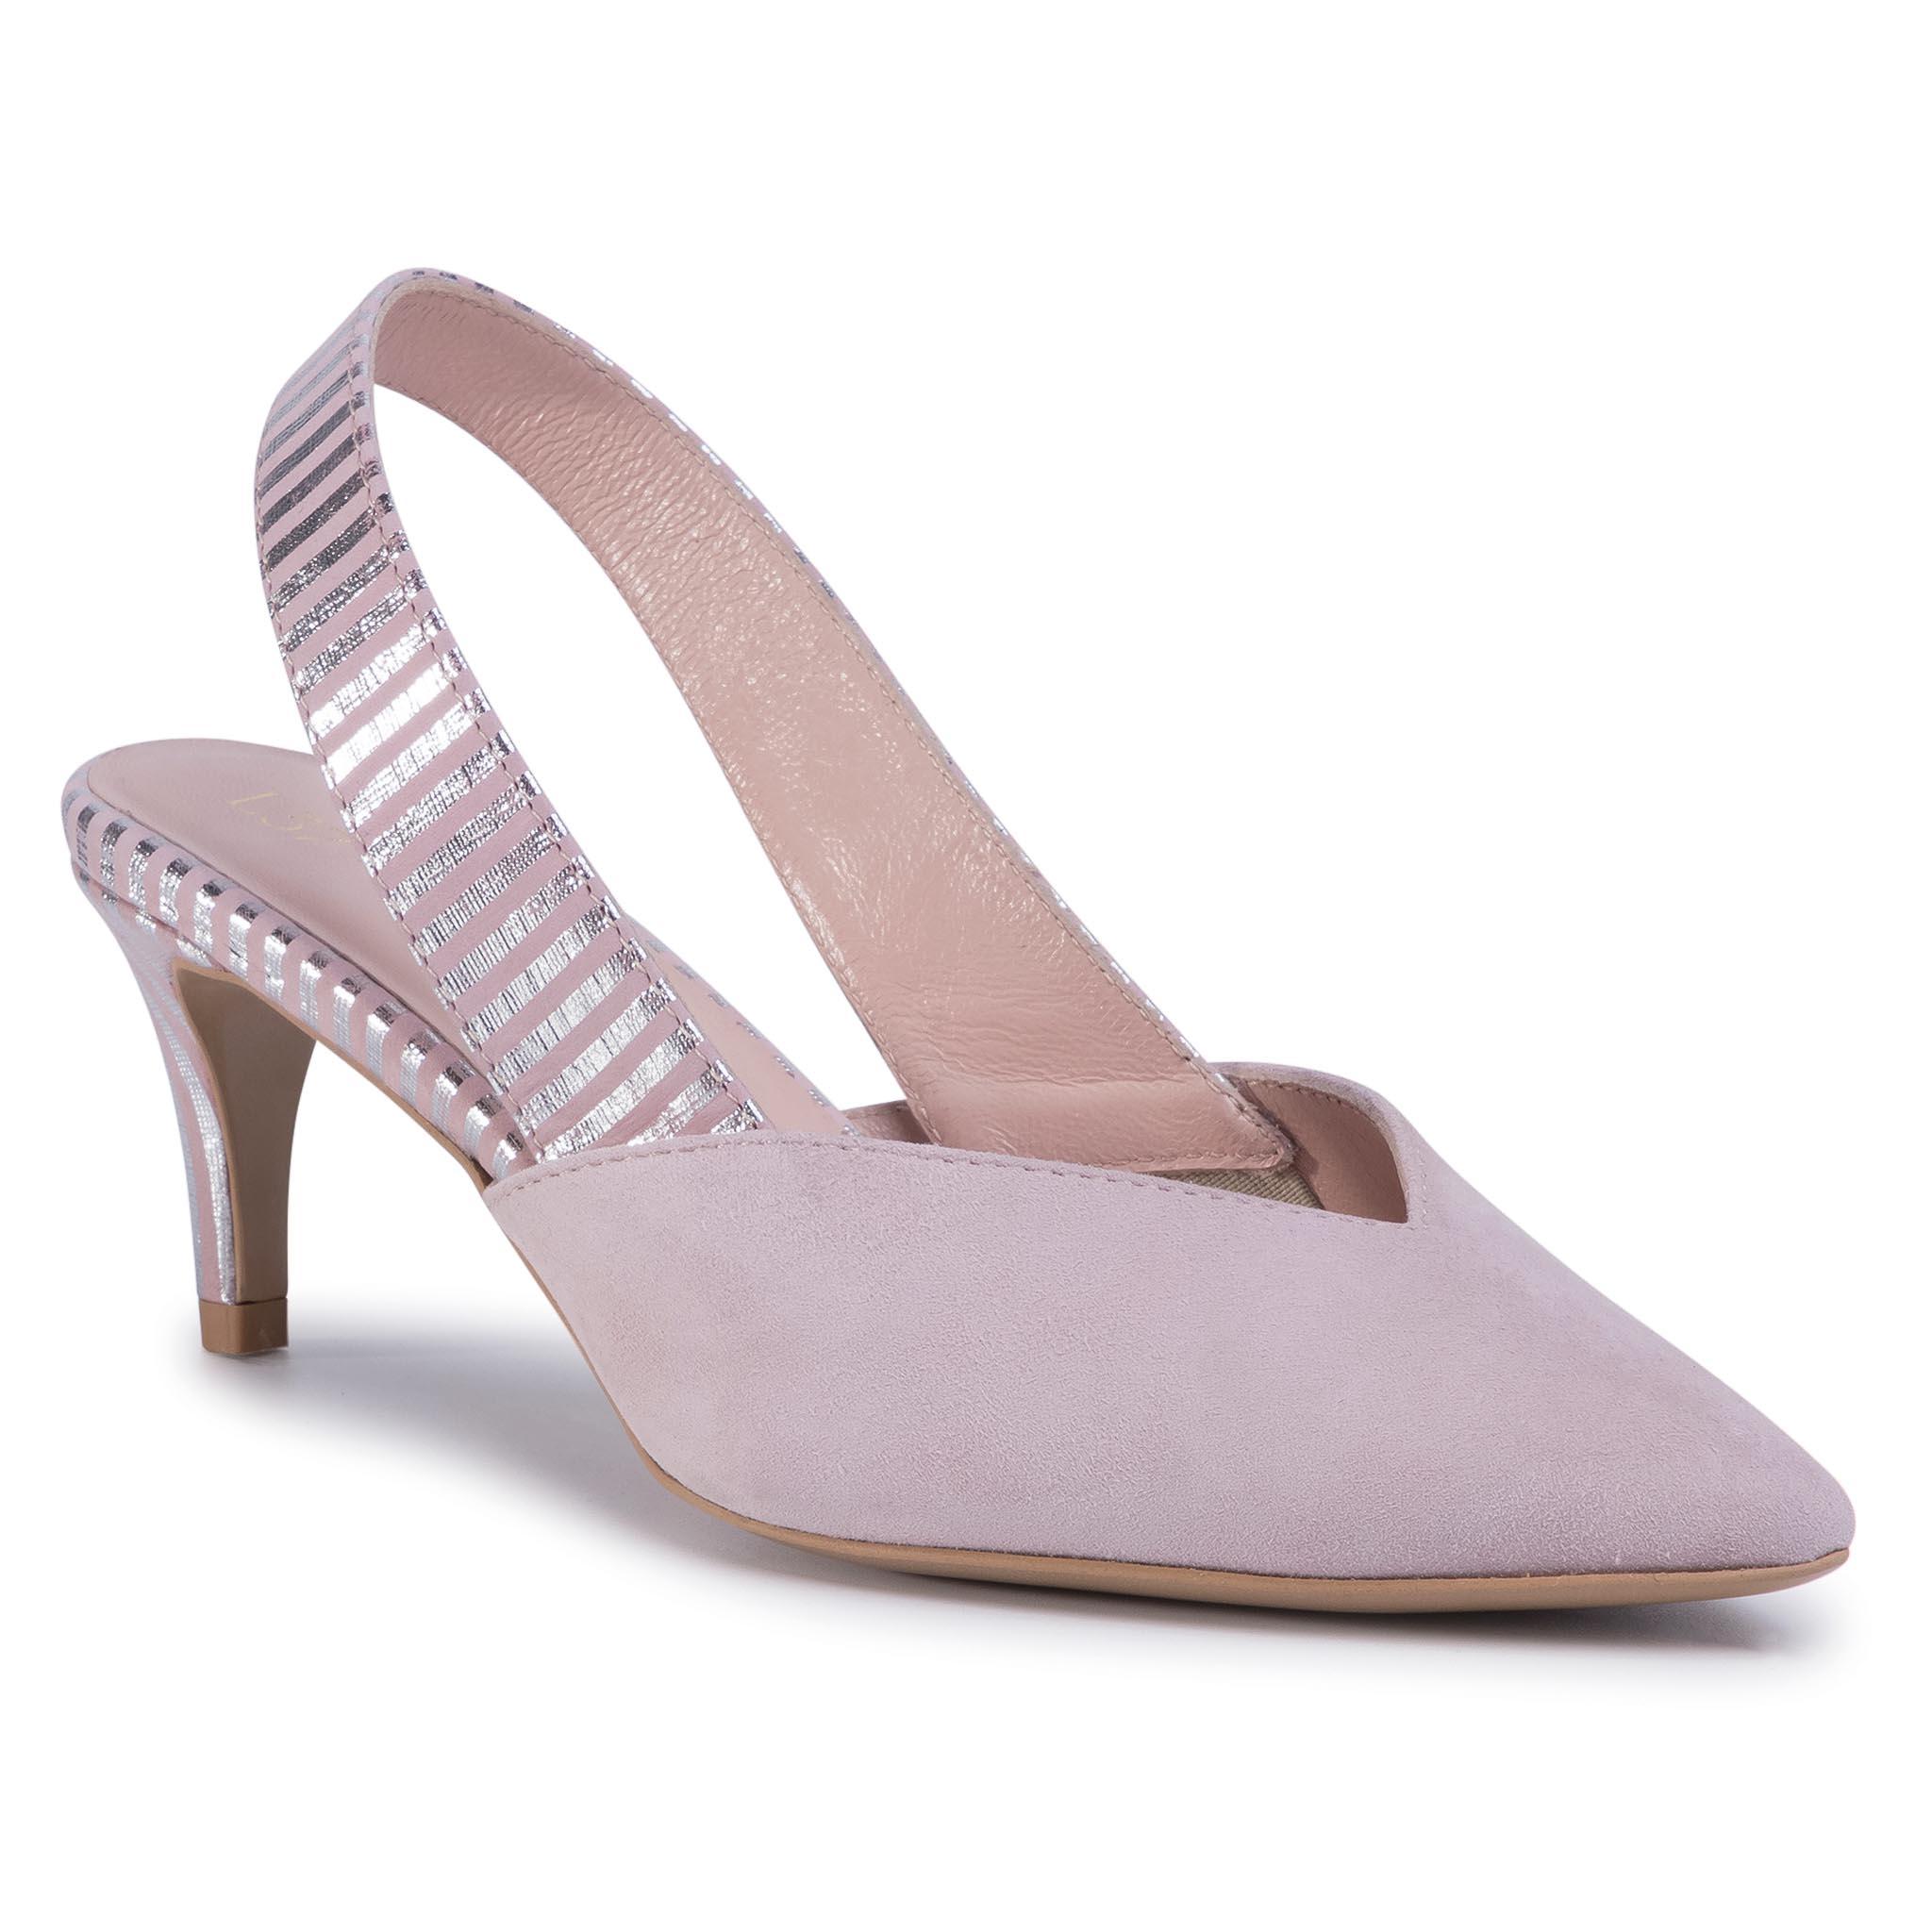 Sandále L37 - Hot In The City Z1P13 Pink